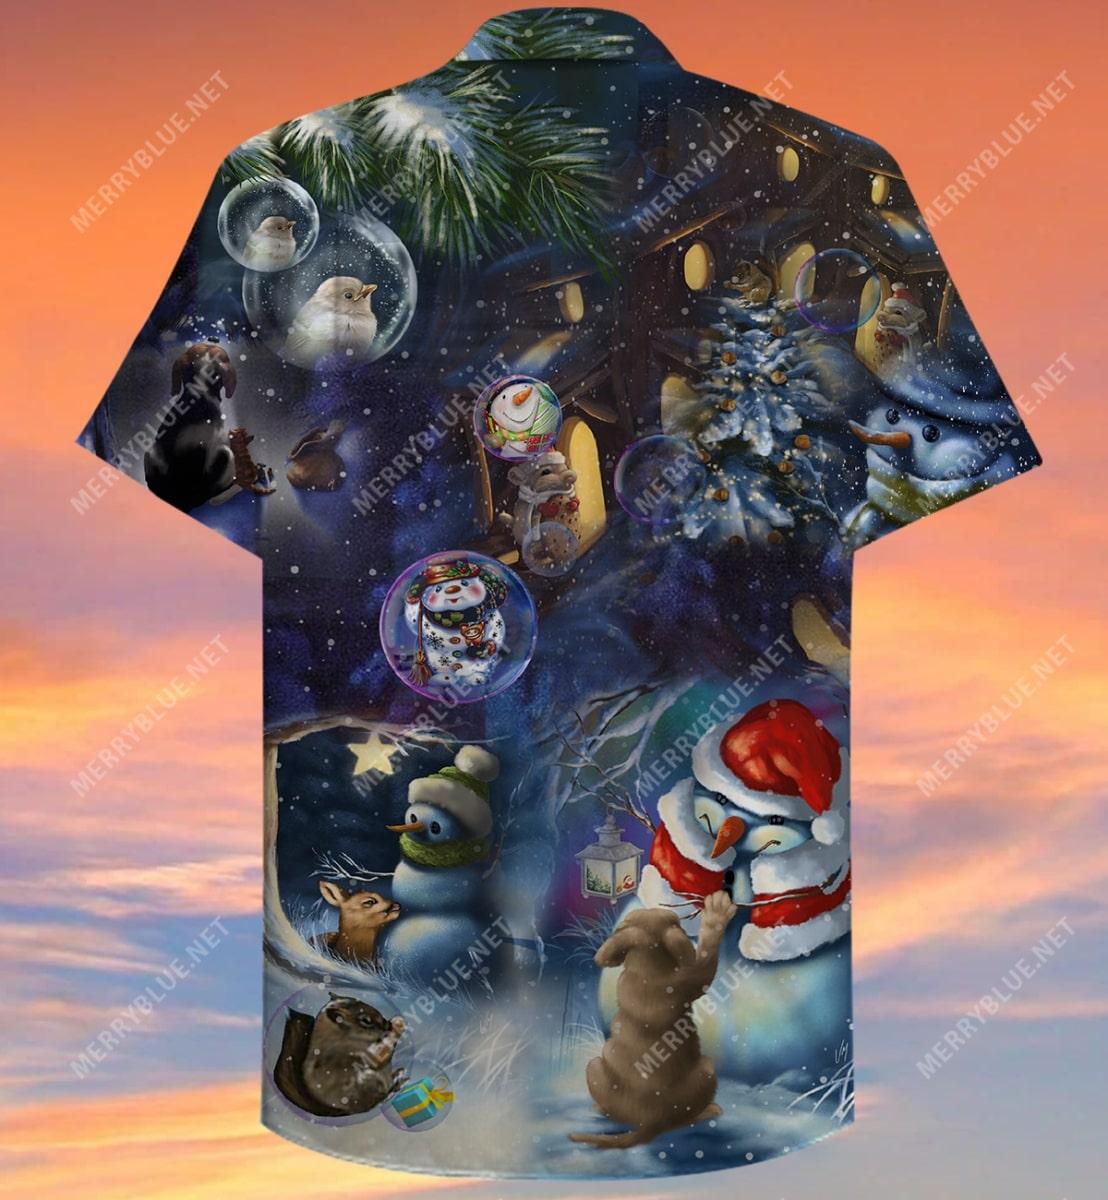 christmas in the wood full printing hawaiian shirt 4